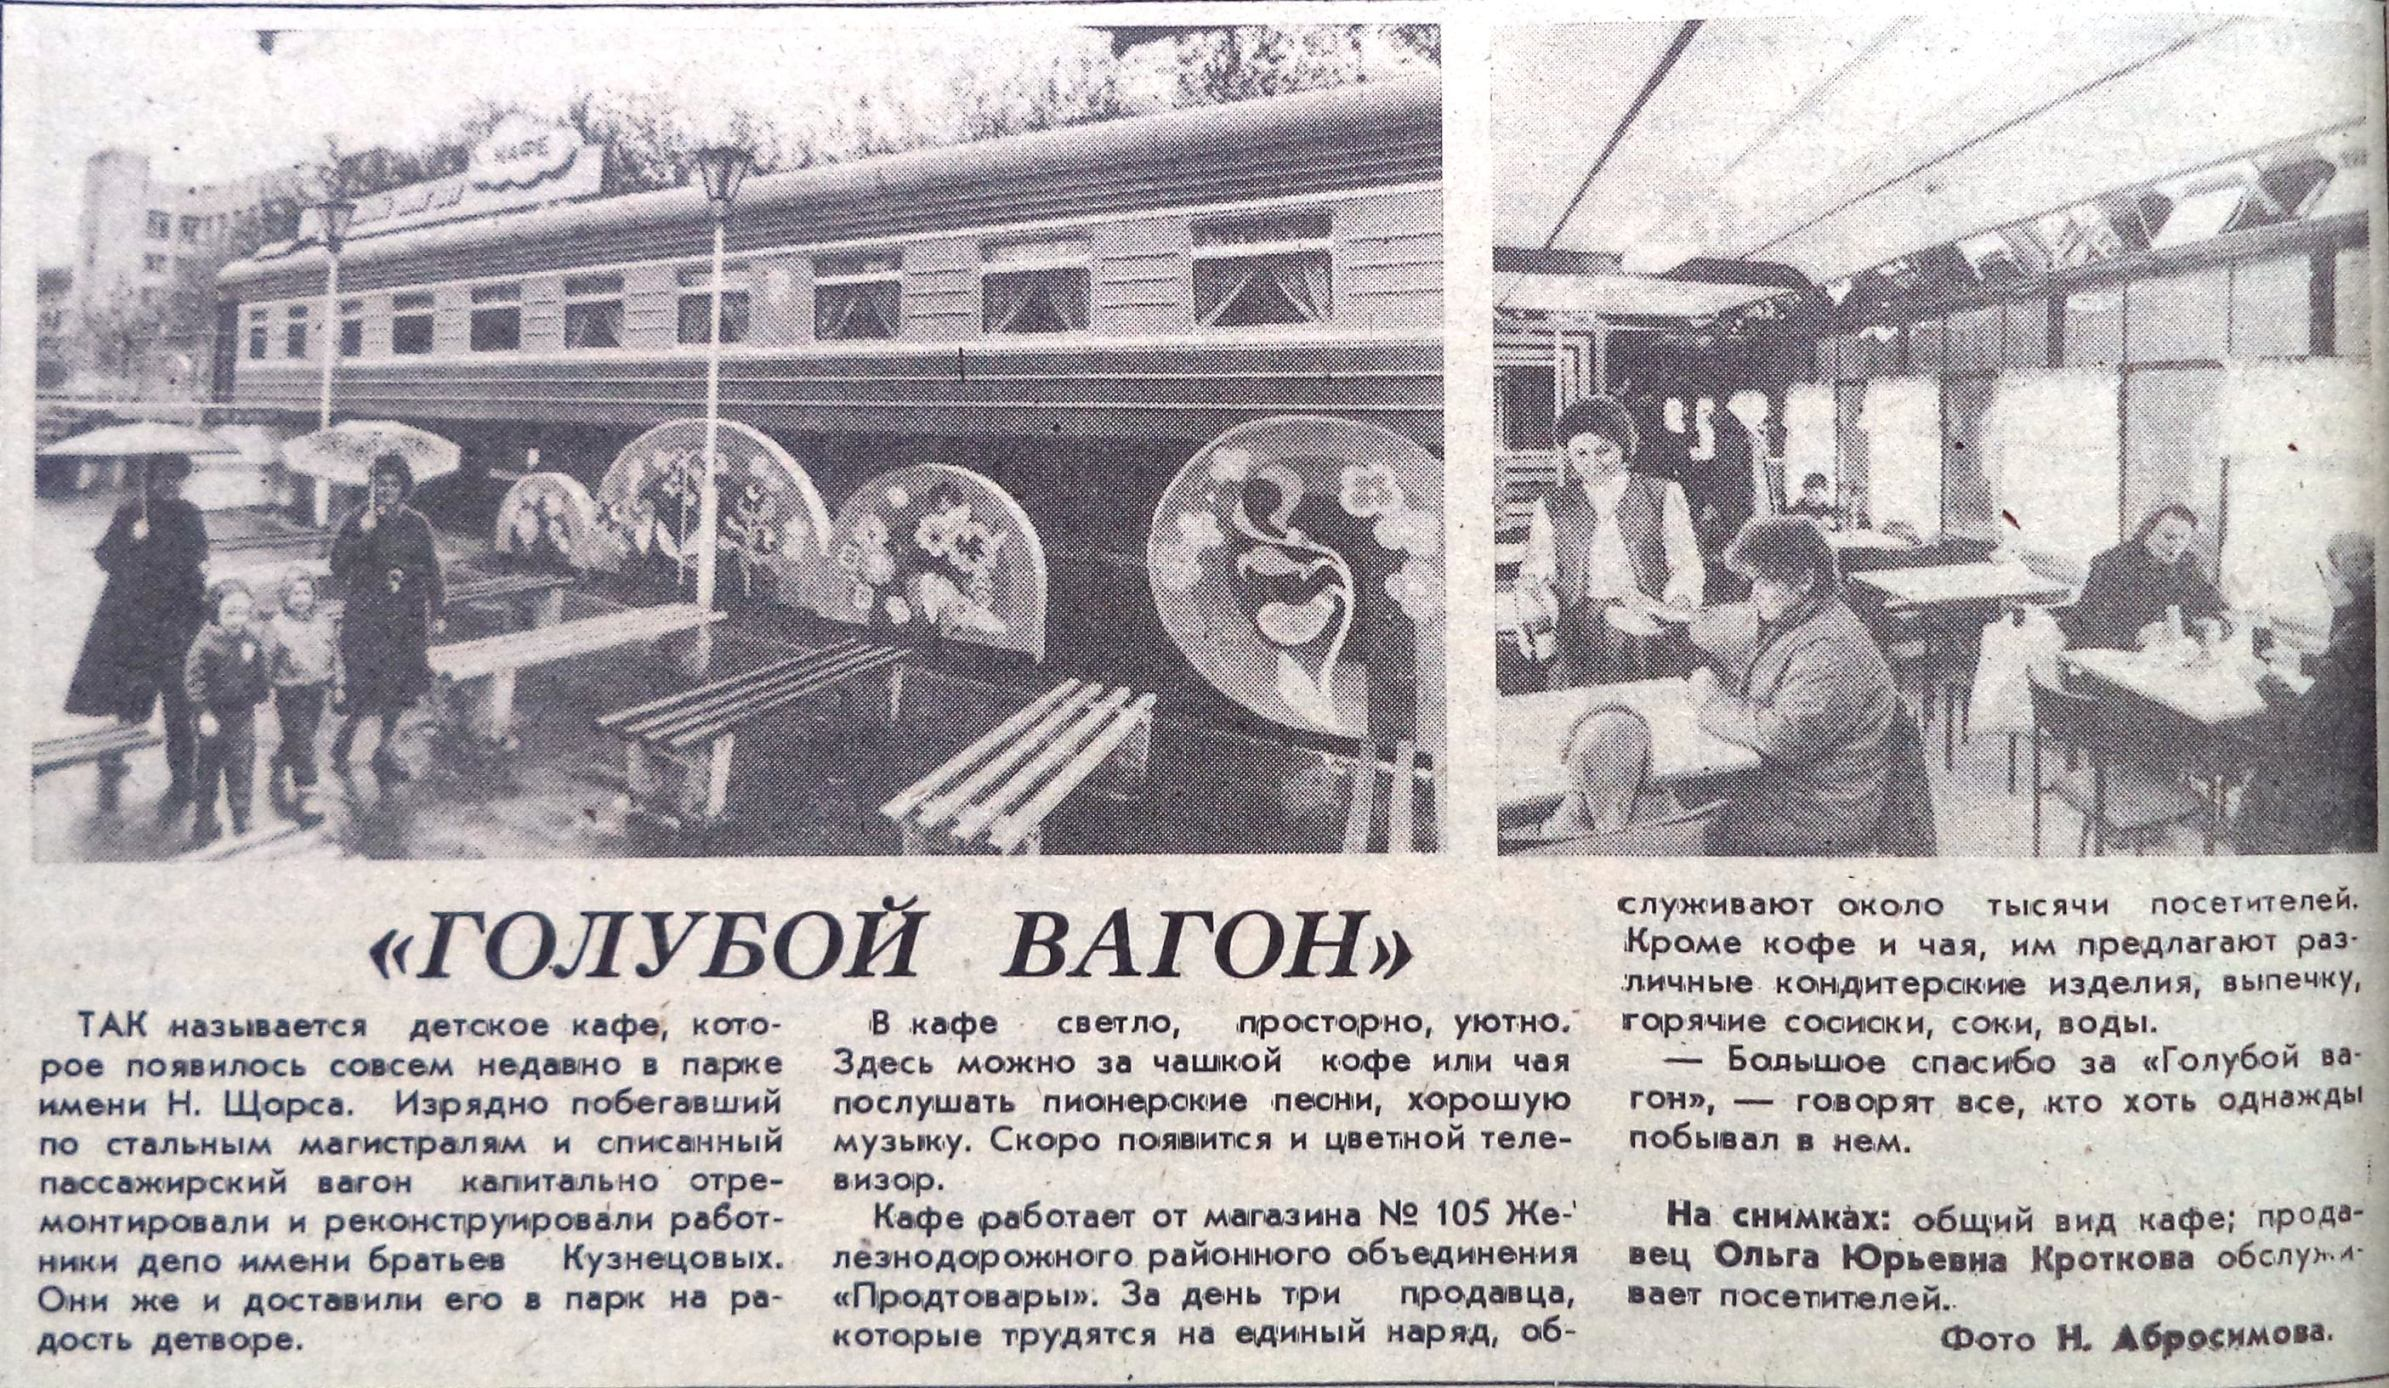 Урицкого-ФОТО-43-ВЗя-1988-05-30-кафе Голубой Вагон в Парке им. Щорса-min